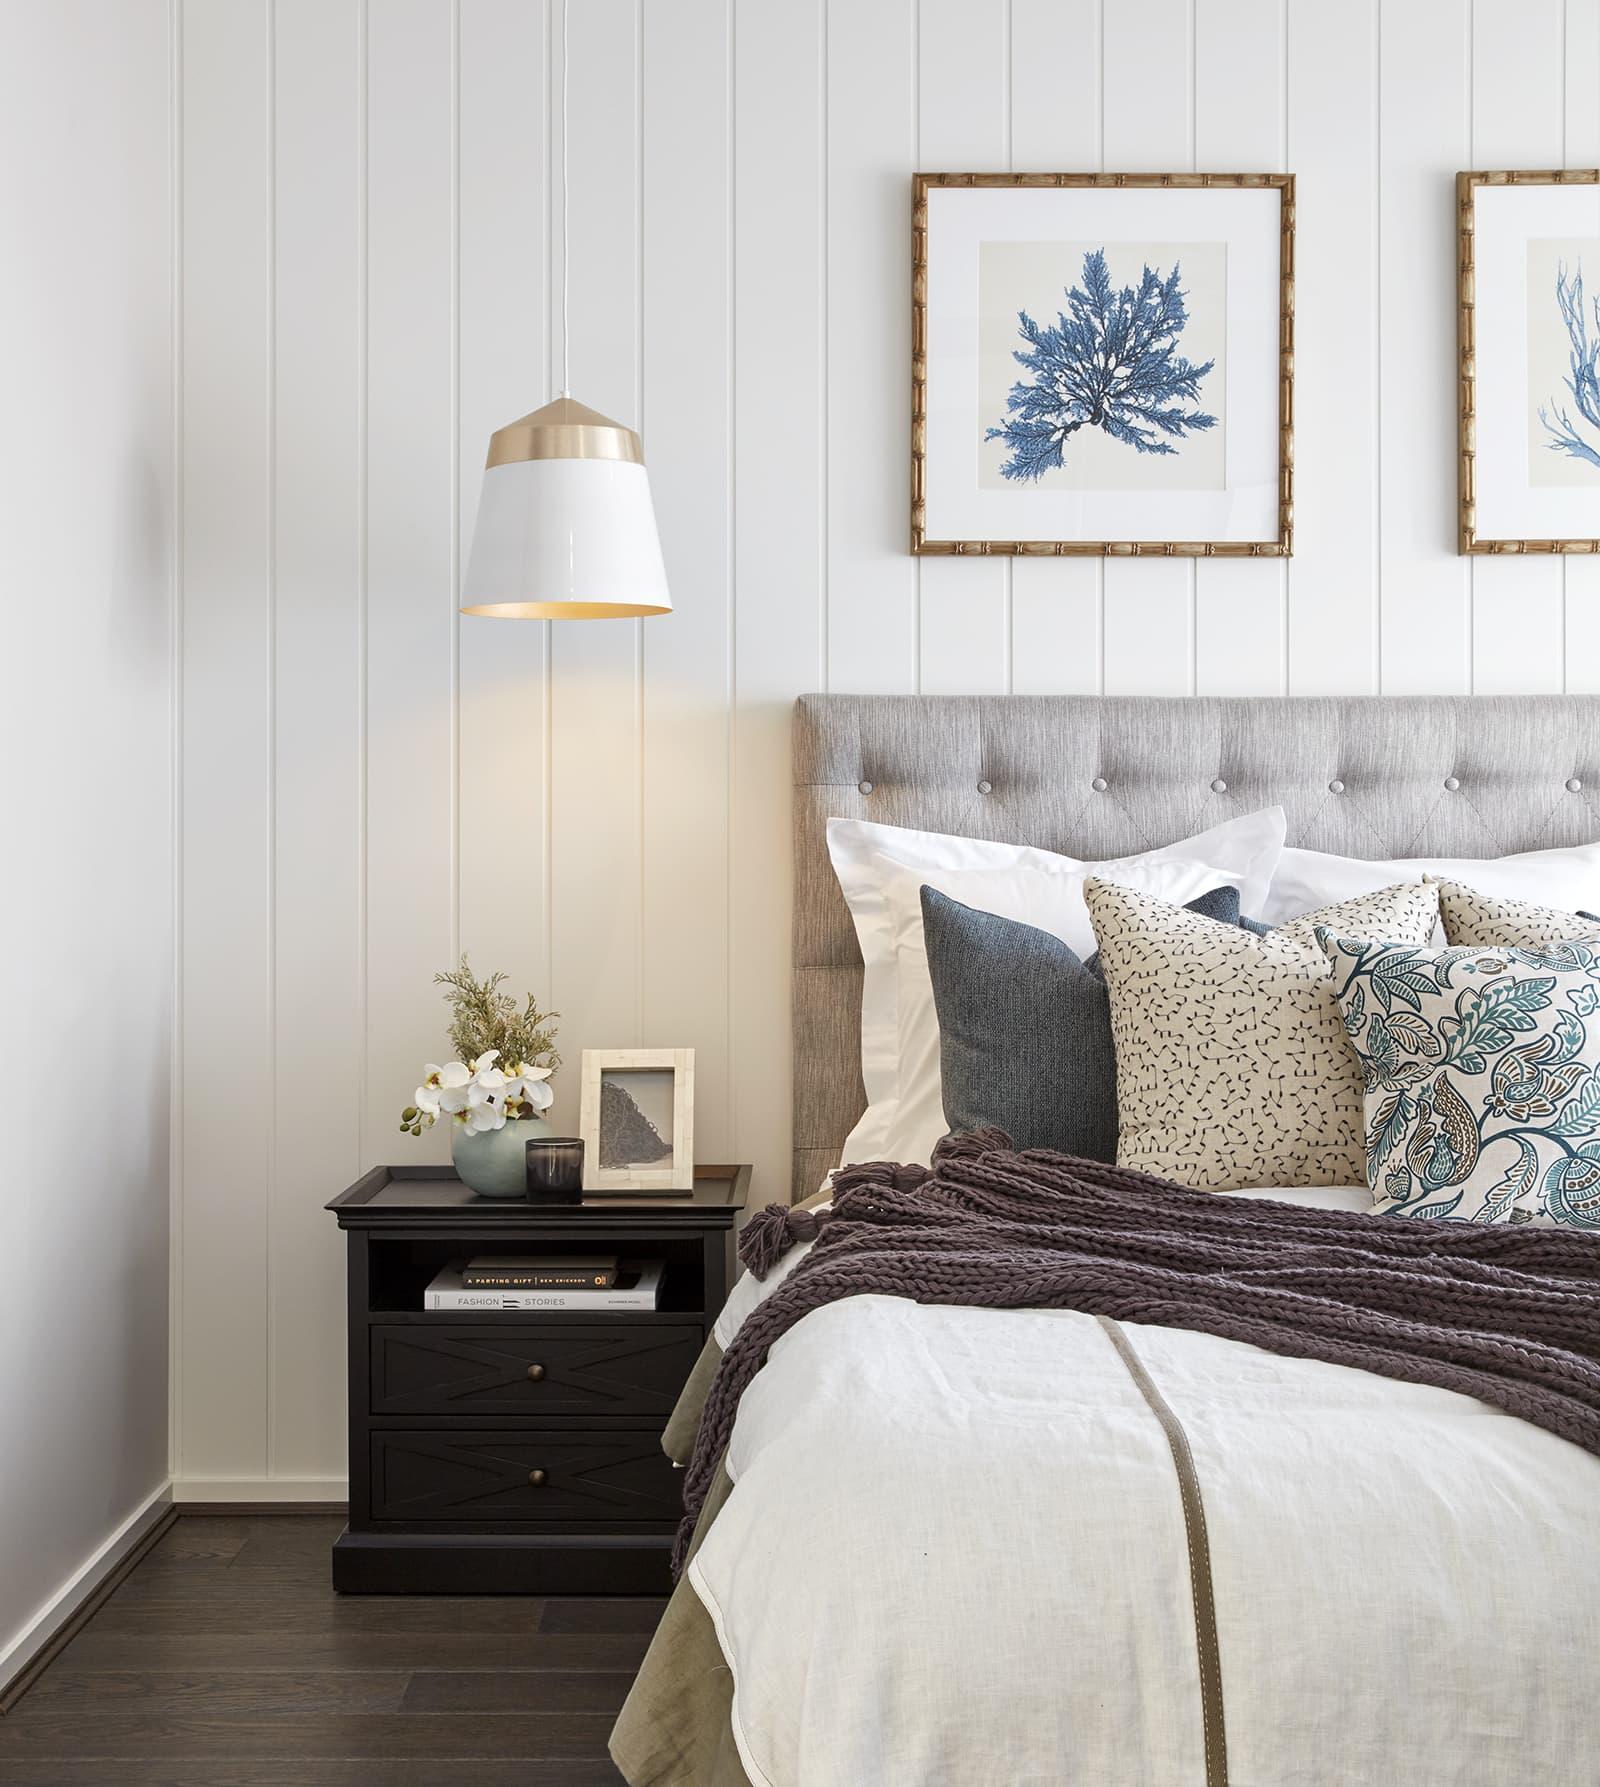 Bedroom Feature Wall Ideas: 10 Stylish Options - TLC Interiors